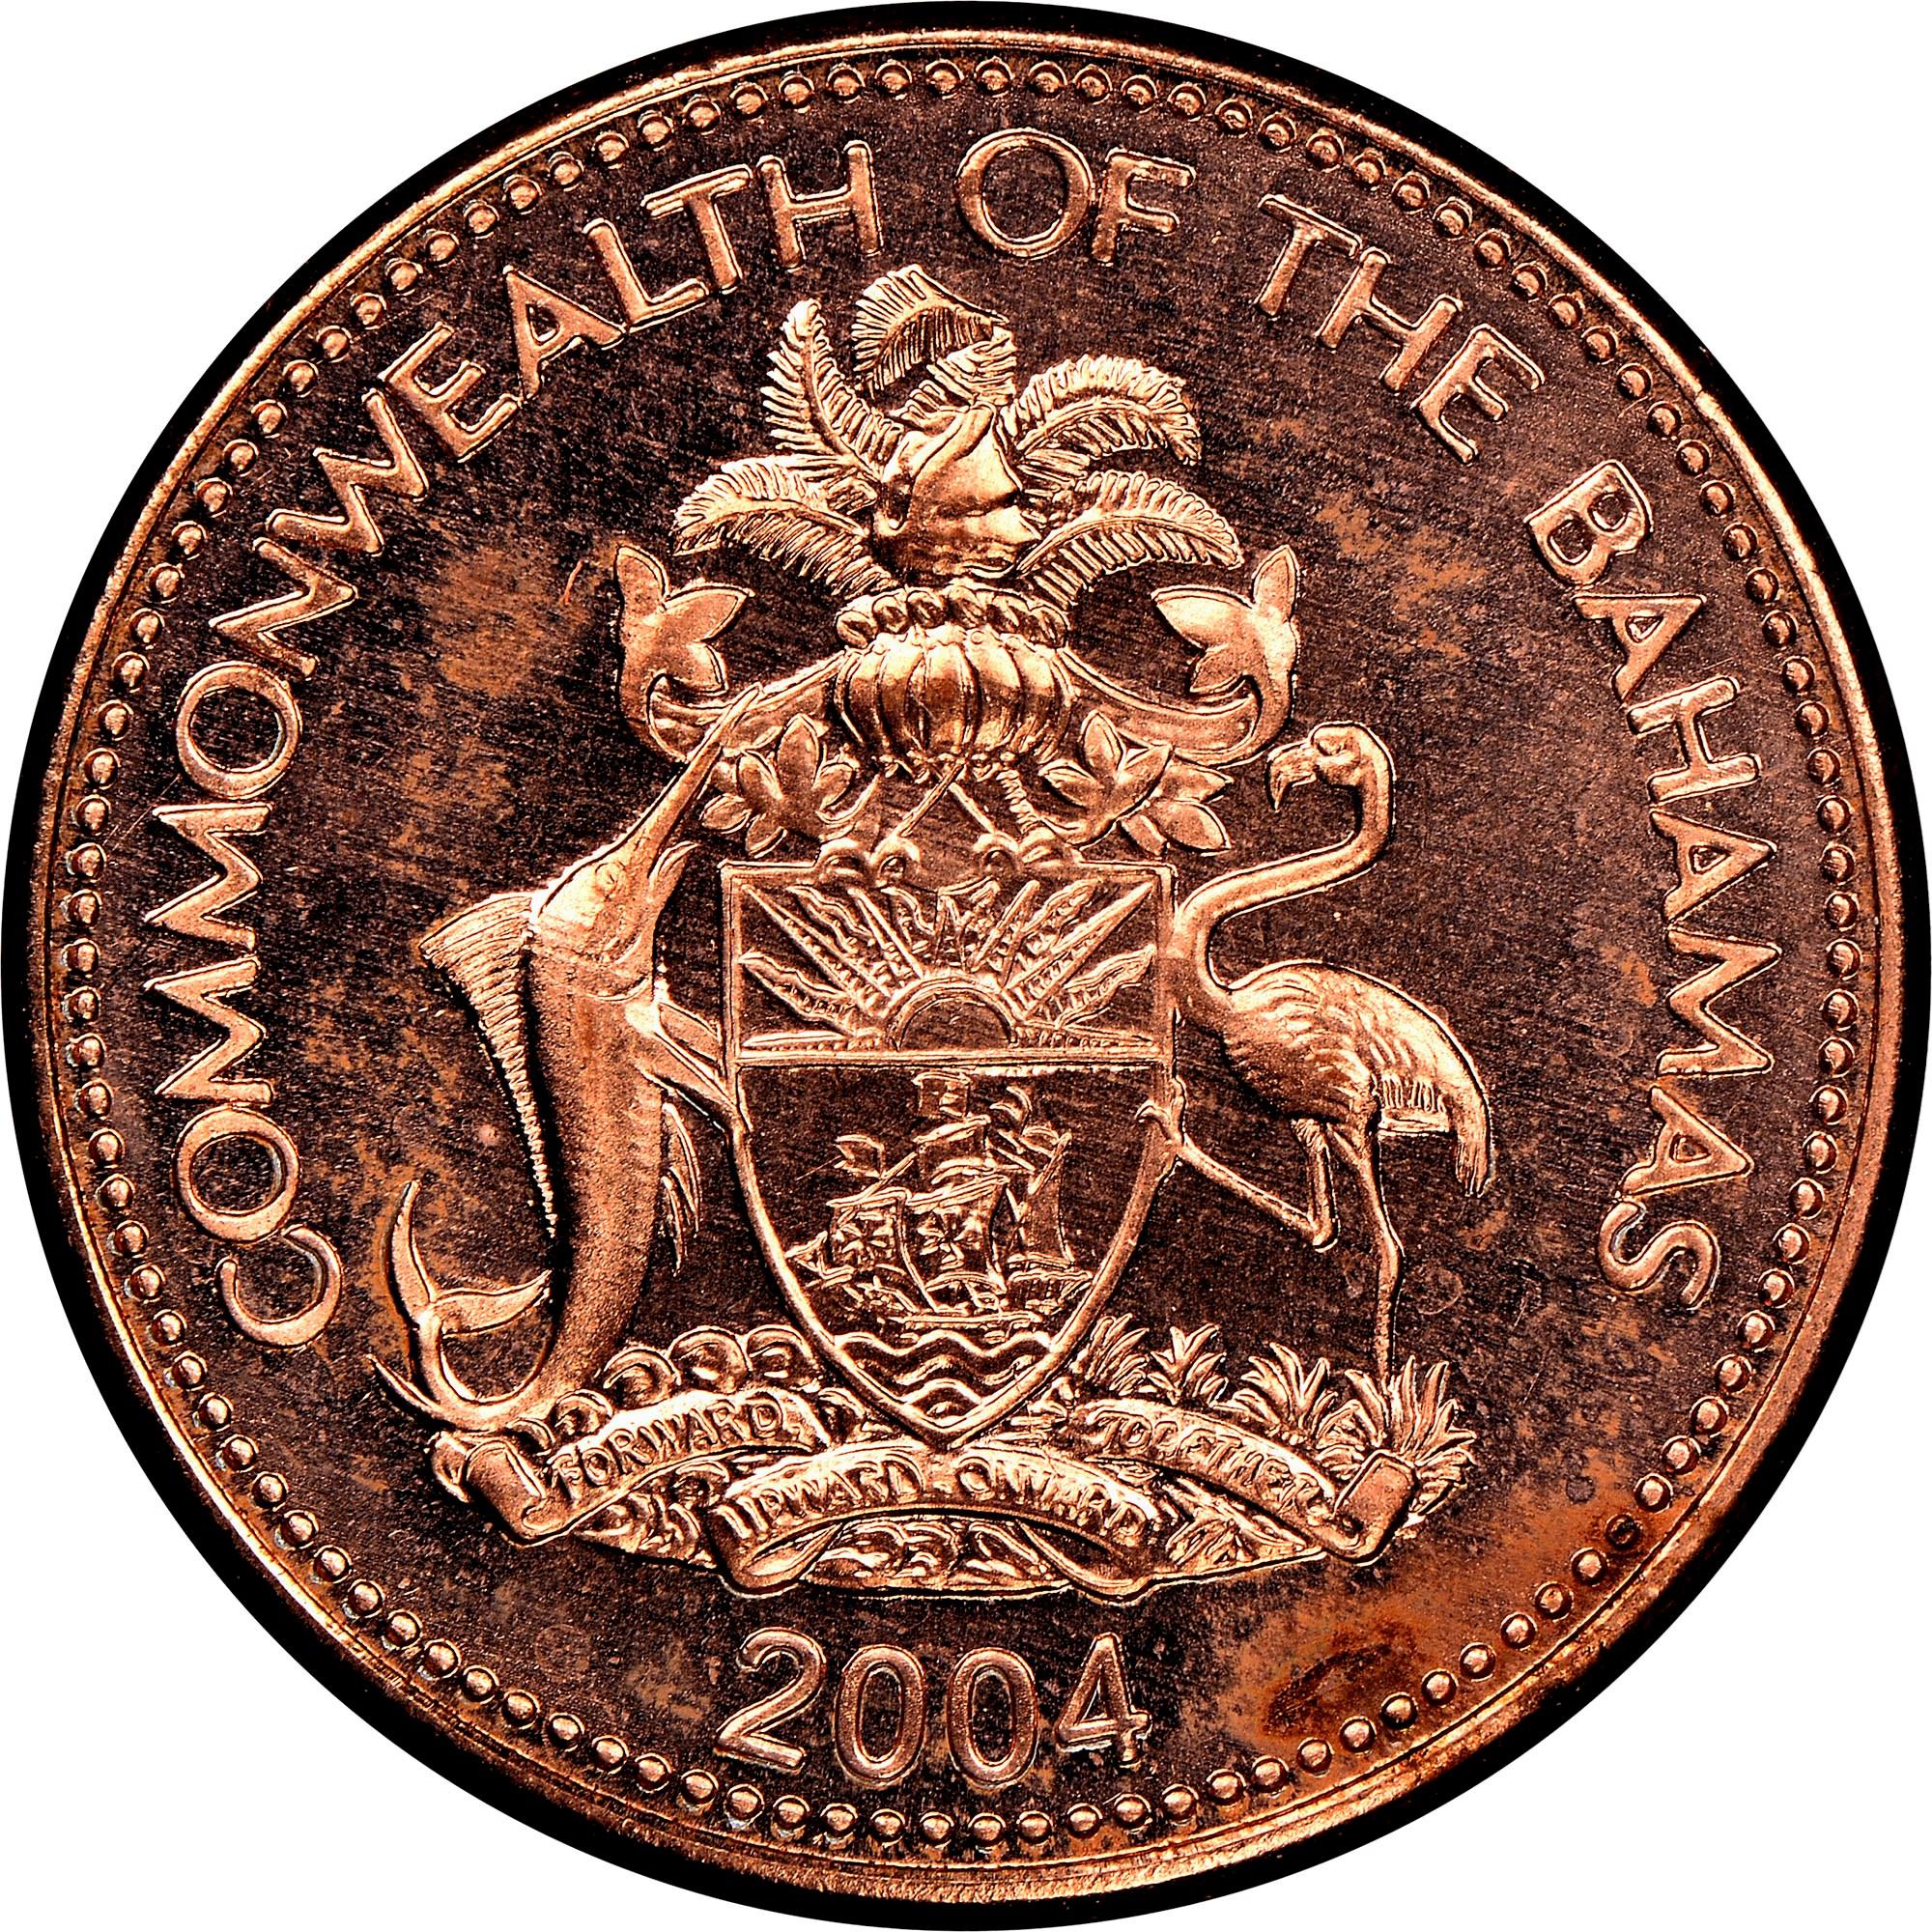 Bahamas Cent obverse